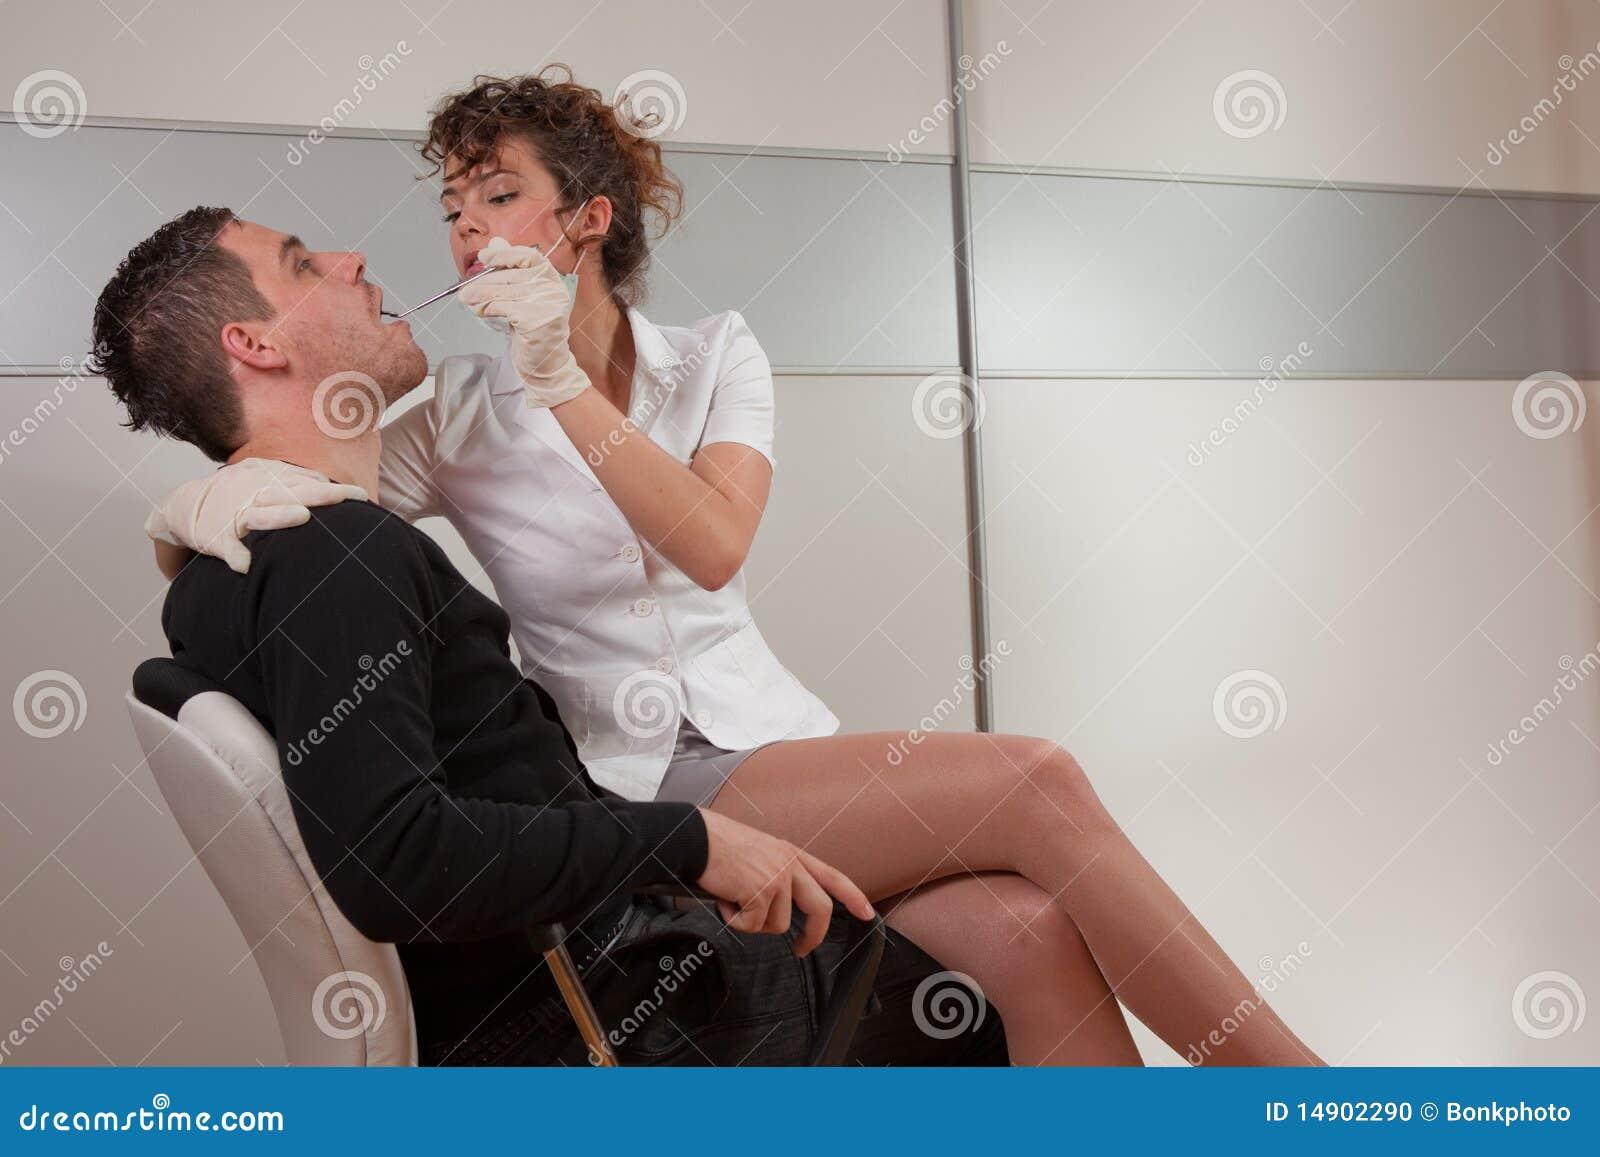 seksualniy-stomatolog